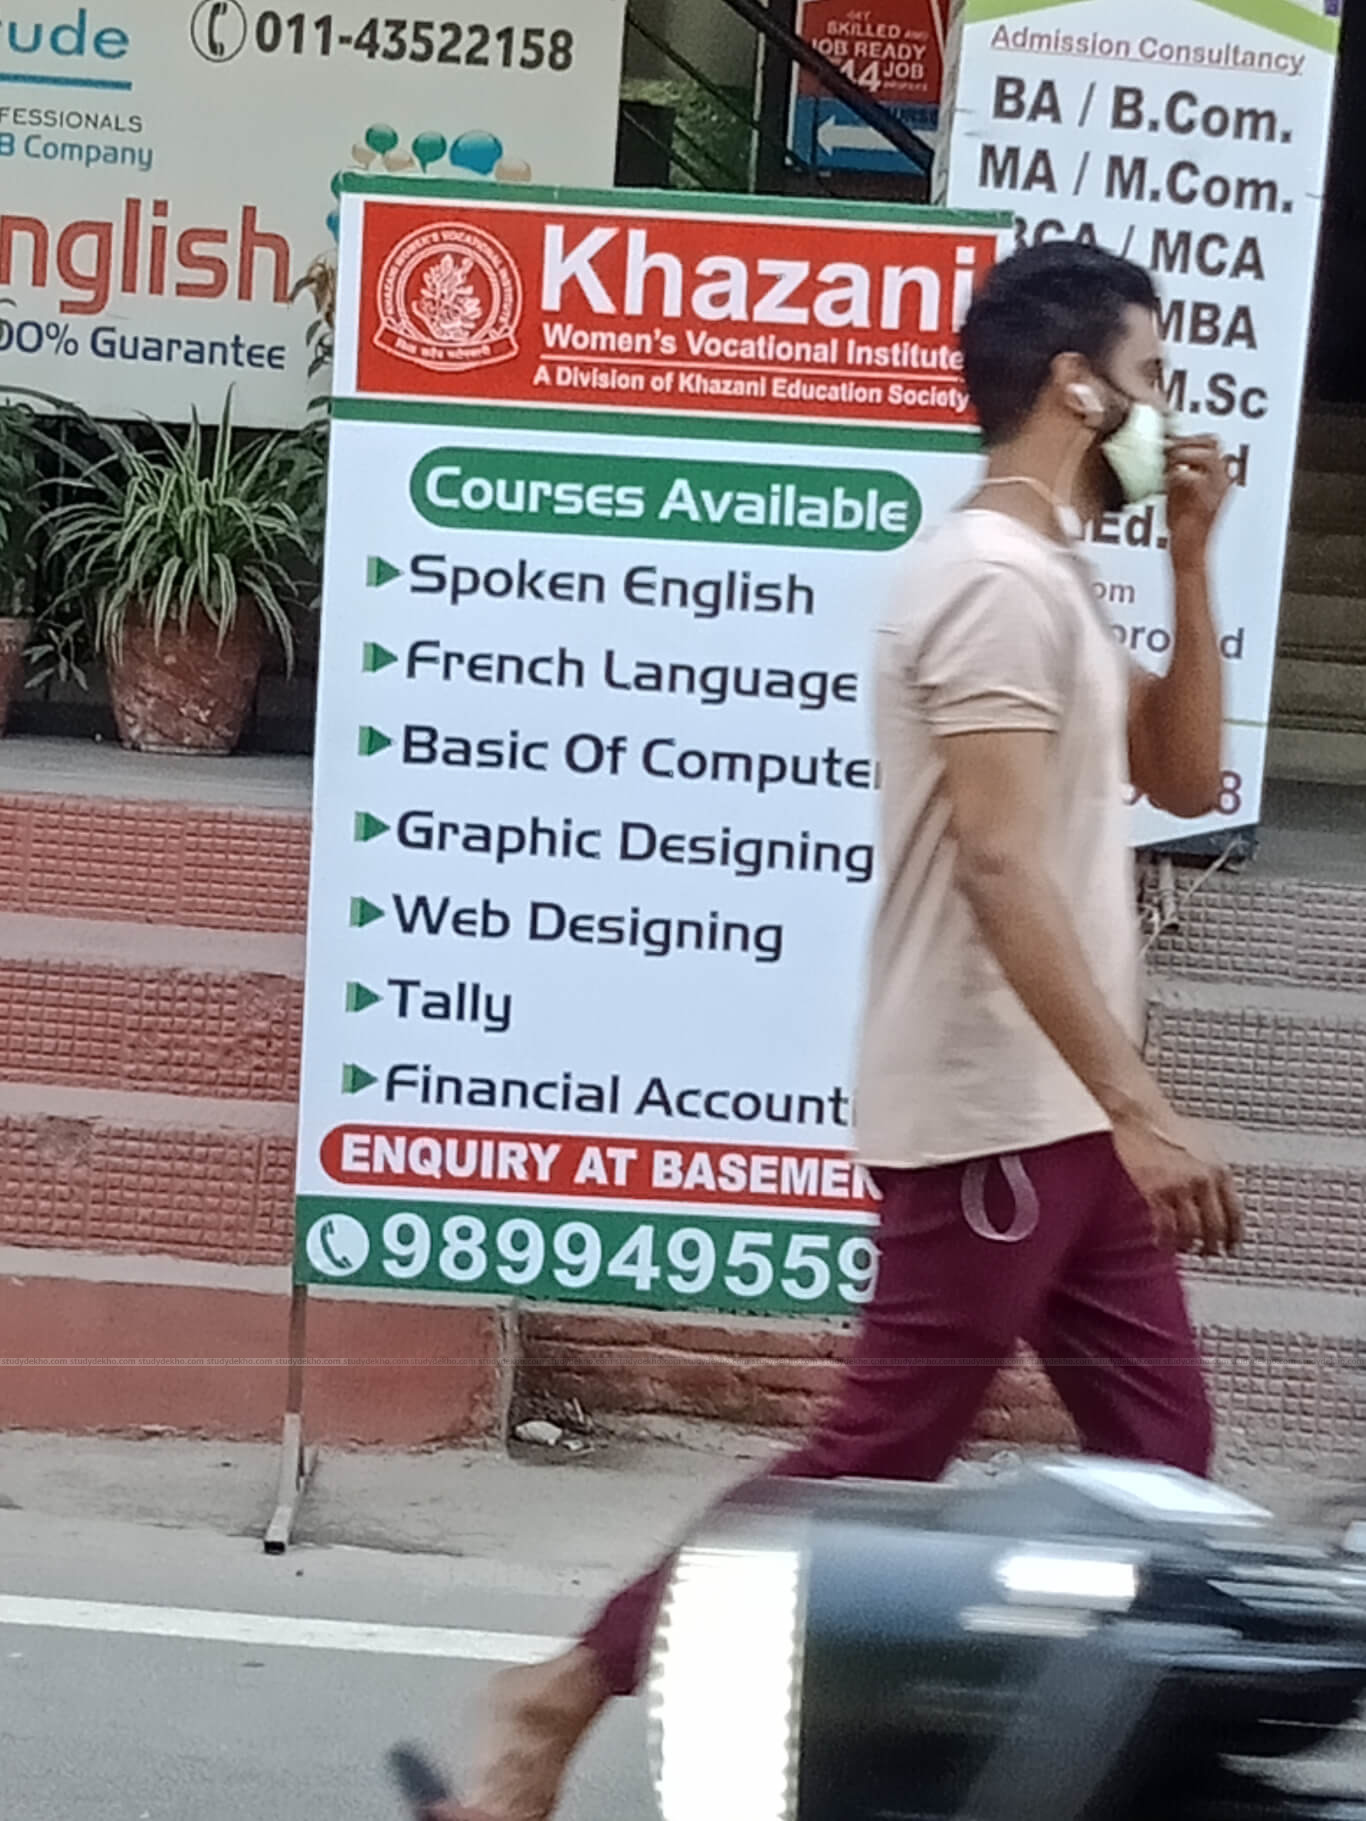 KHAZANI Logo